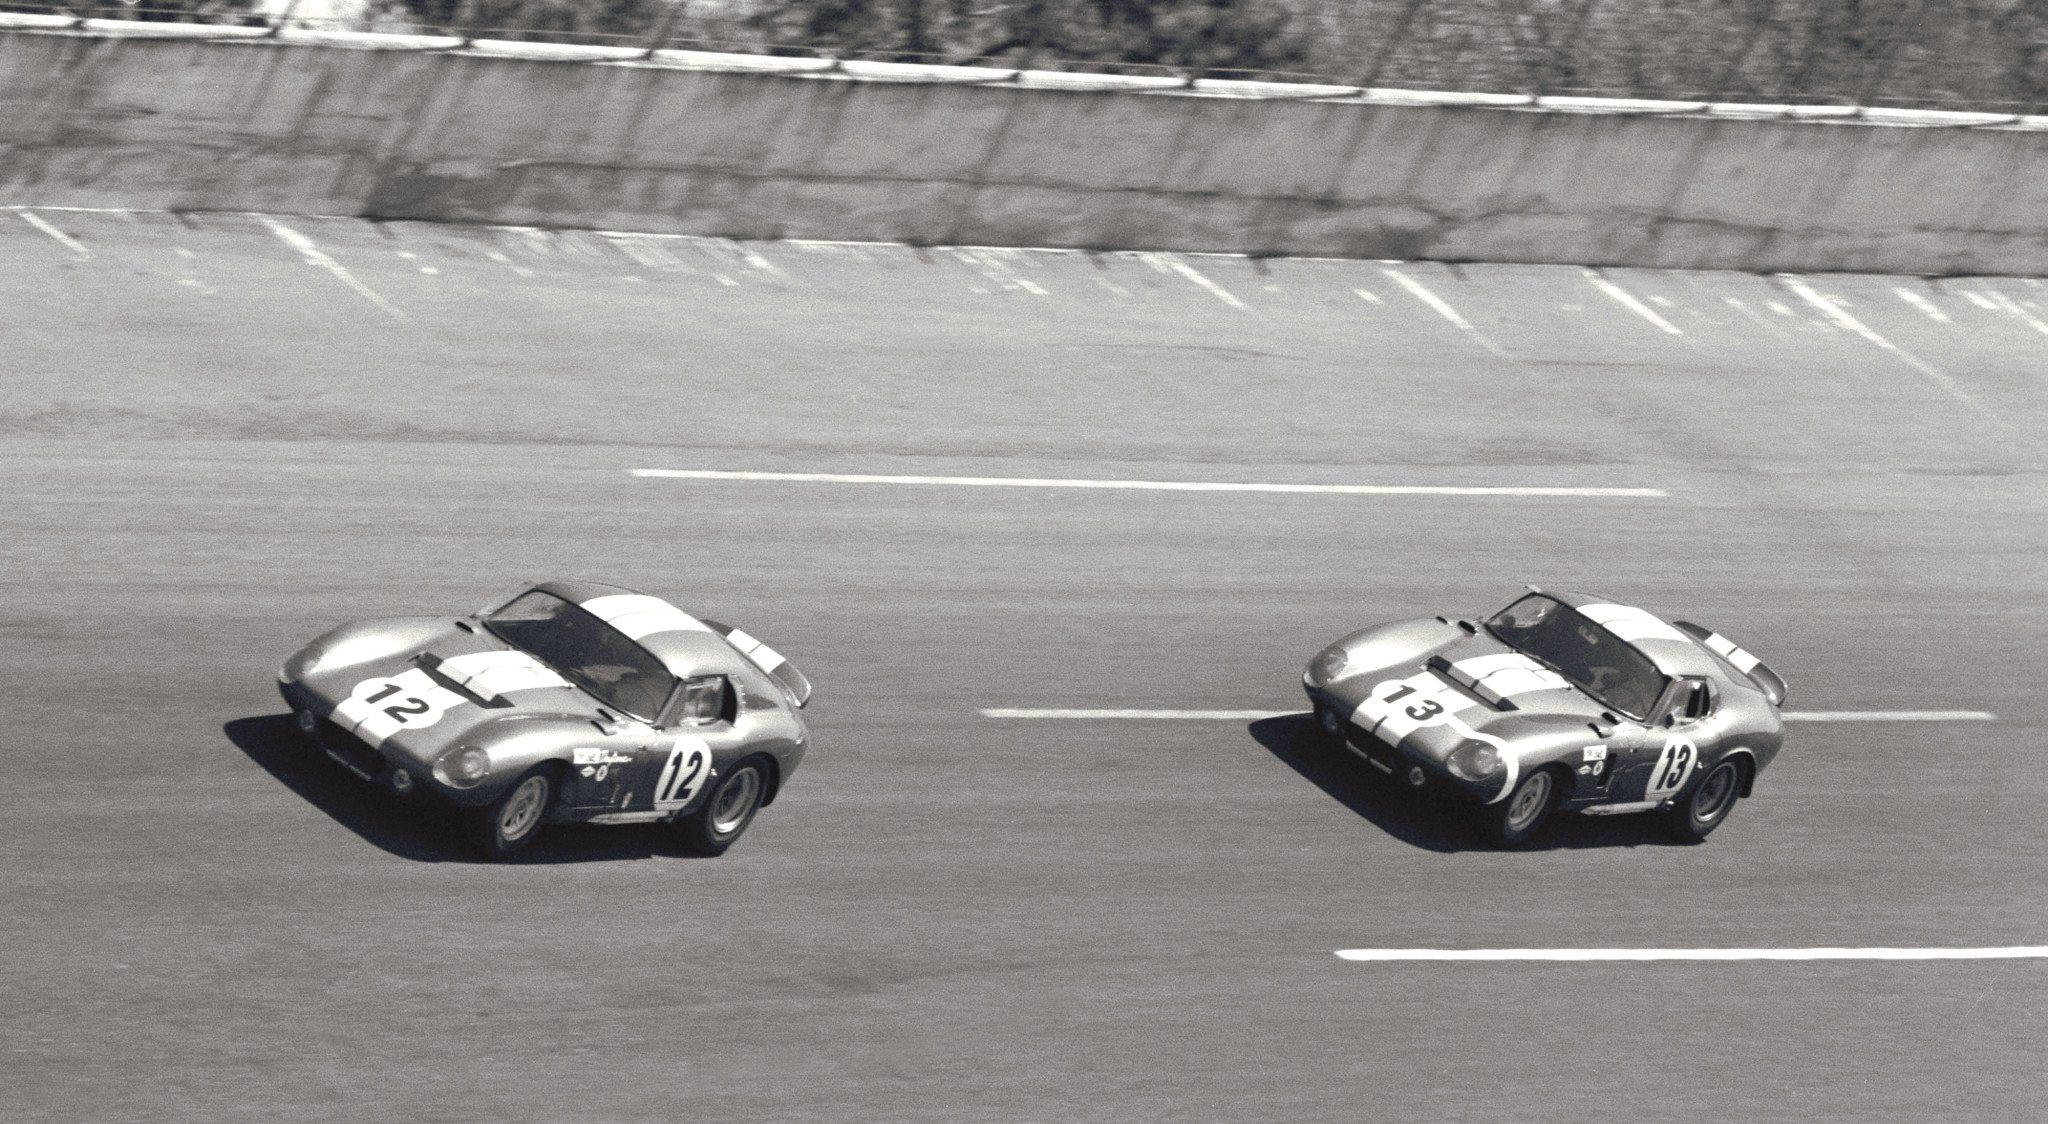 Shelby Daytona Coupes at Sebring 1964